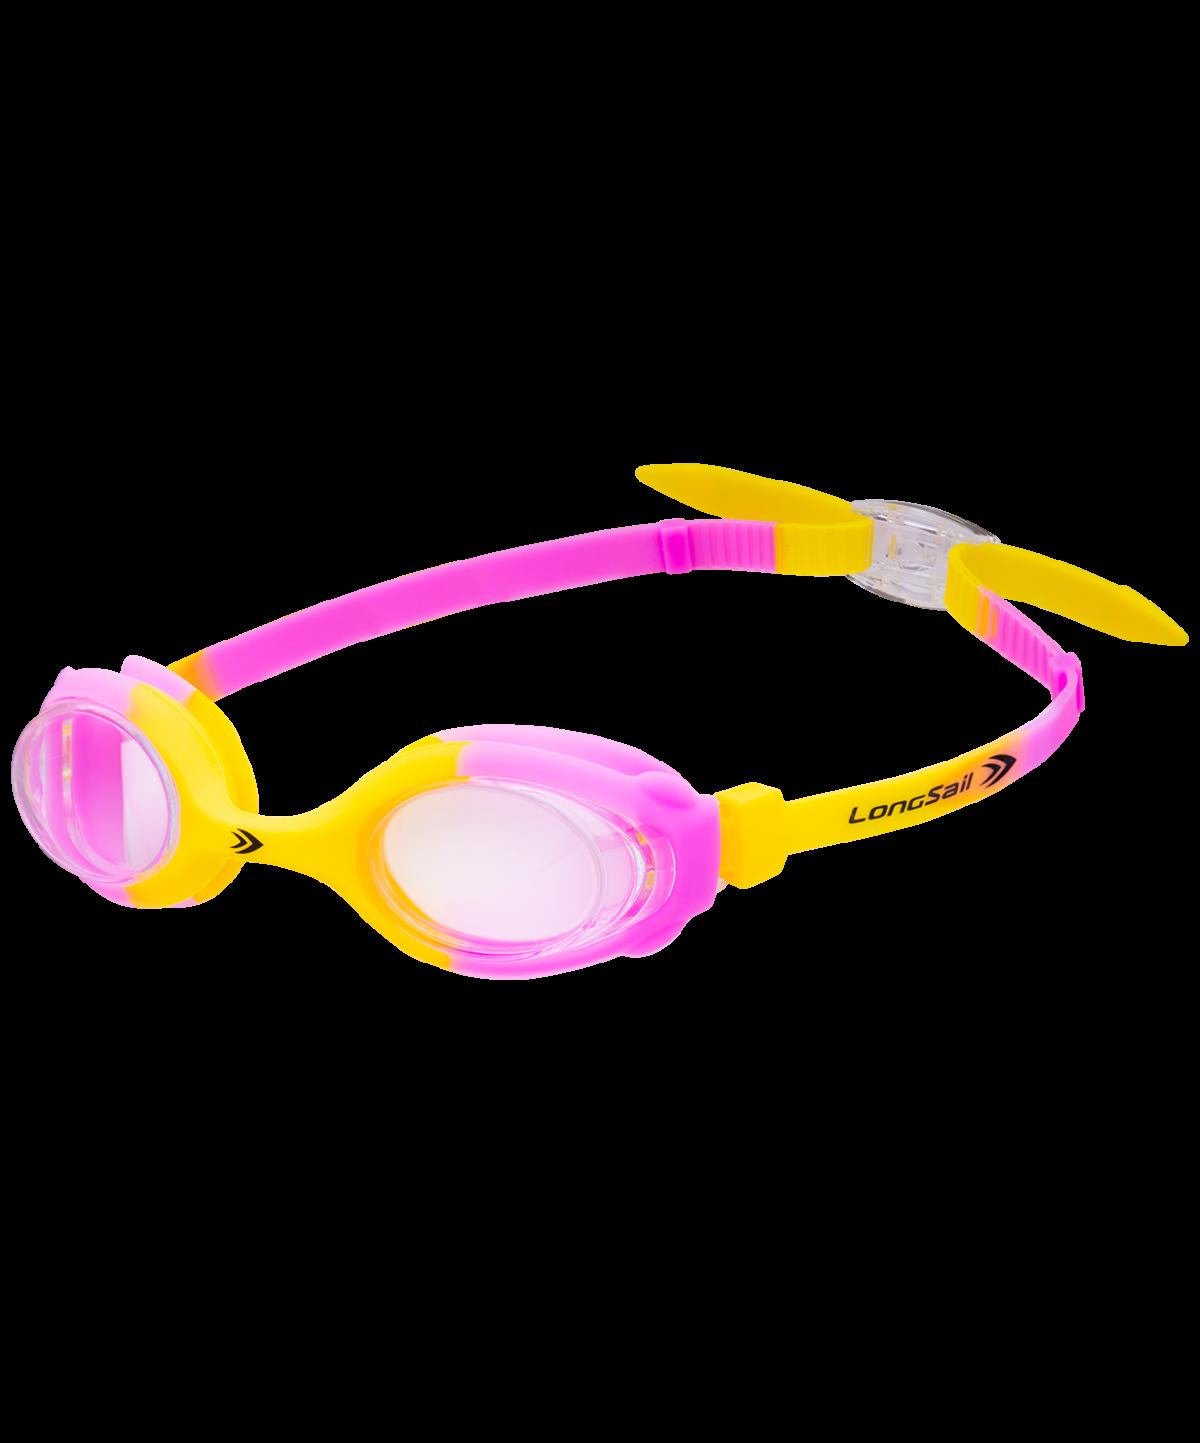 LONGSAIL Kids Crystal Очки для плавания  L041231: желтый/розовый - 1